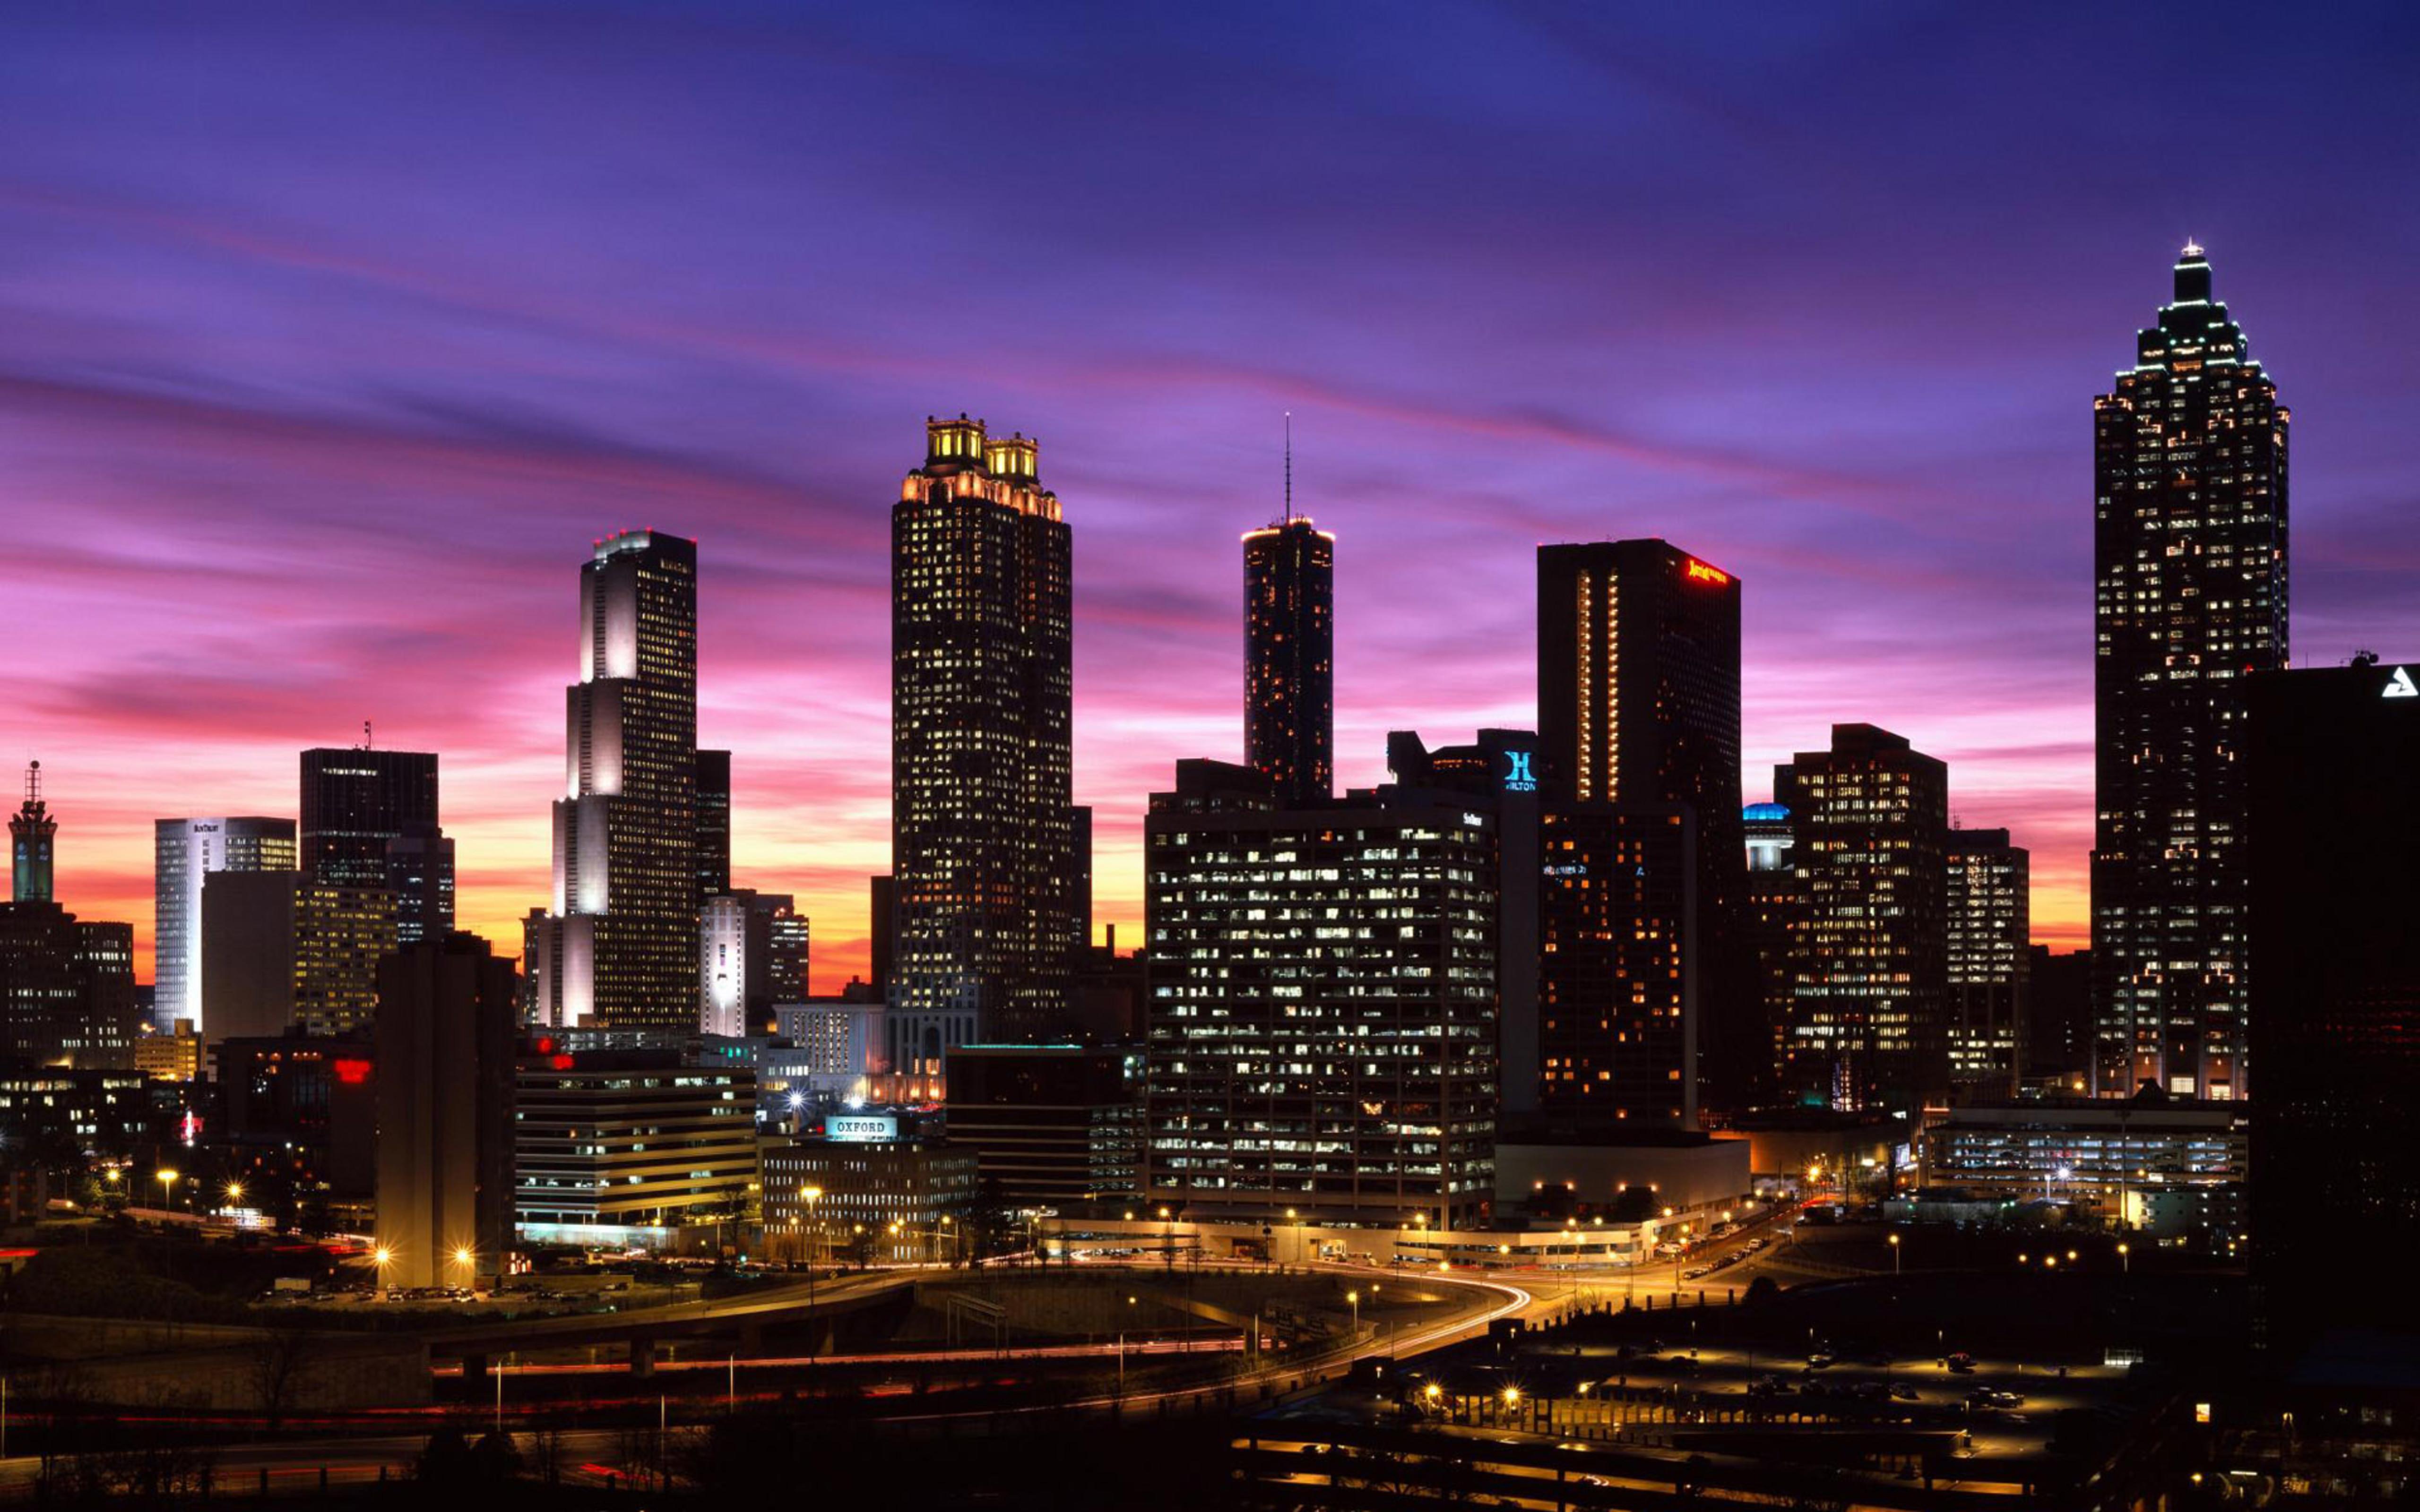 City at night - lights enerywhere